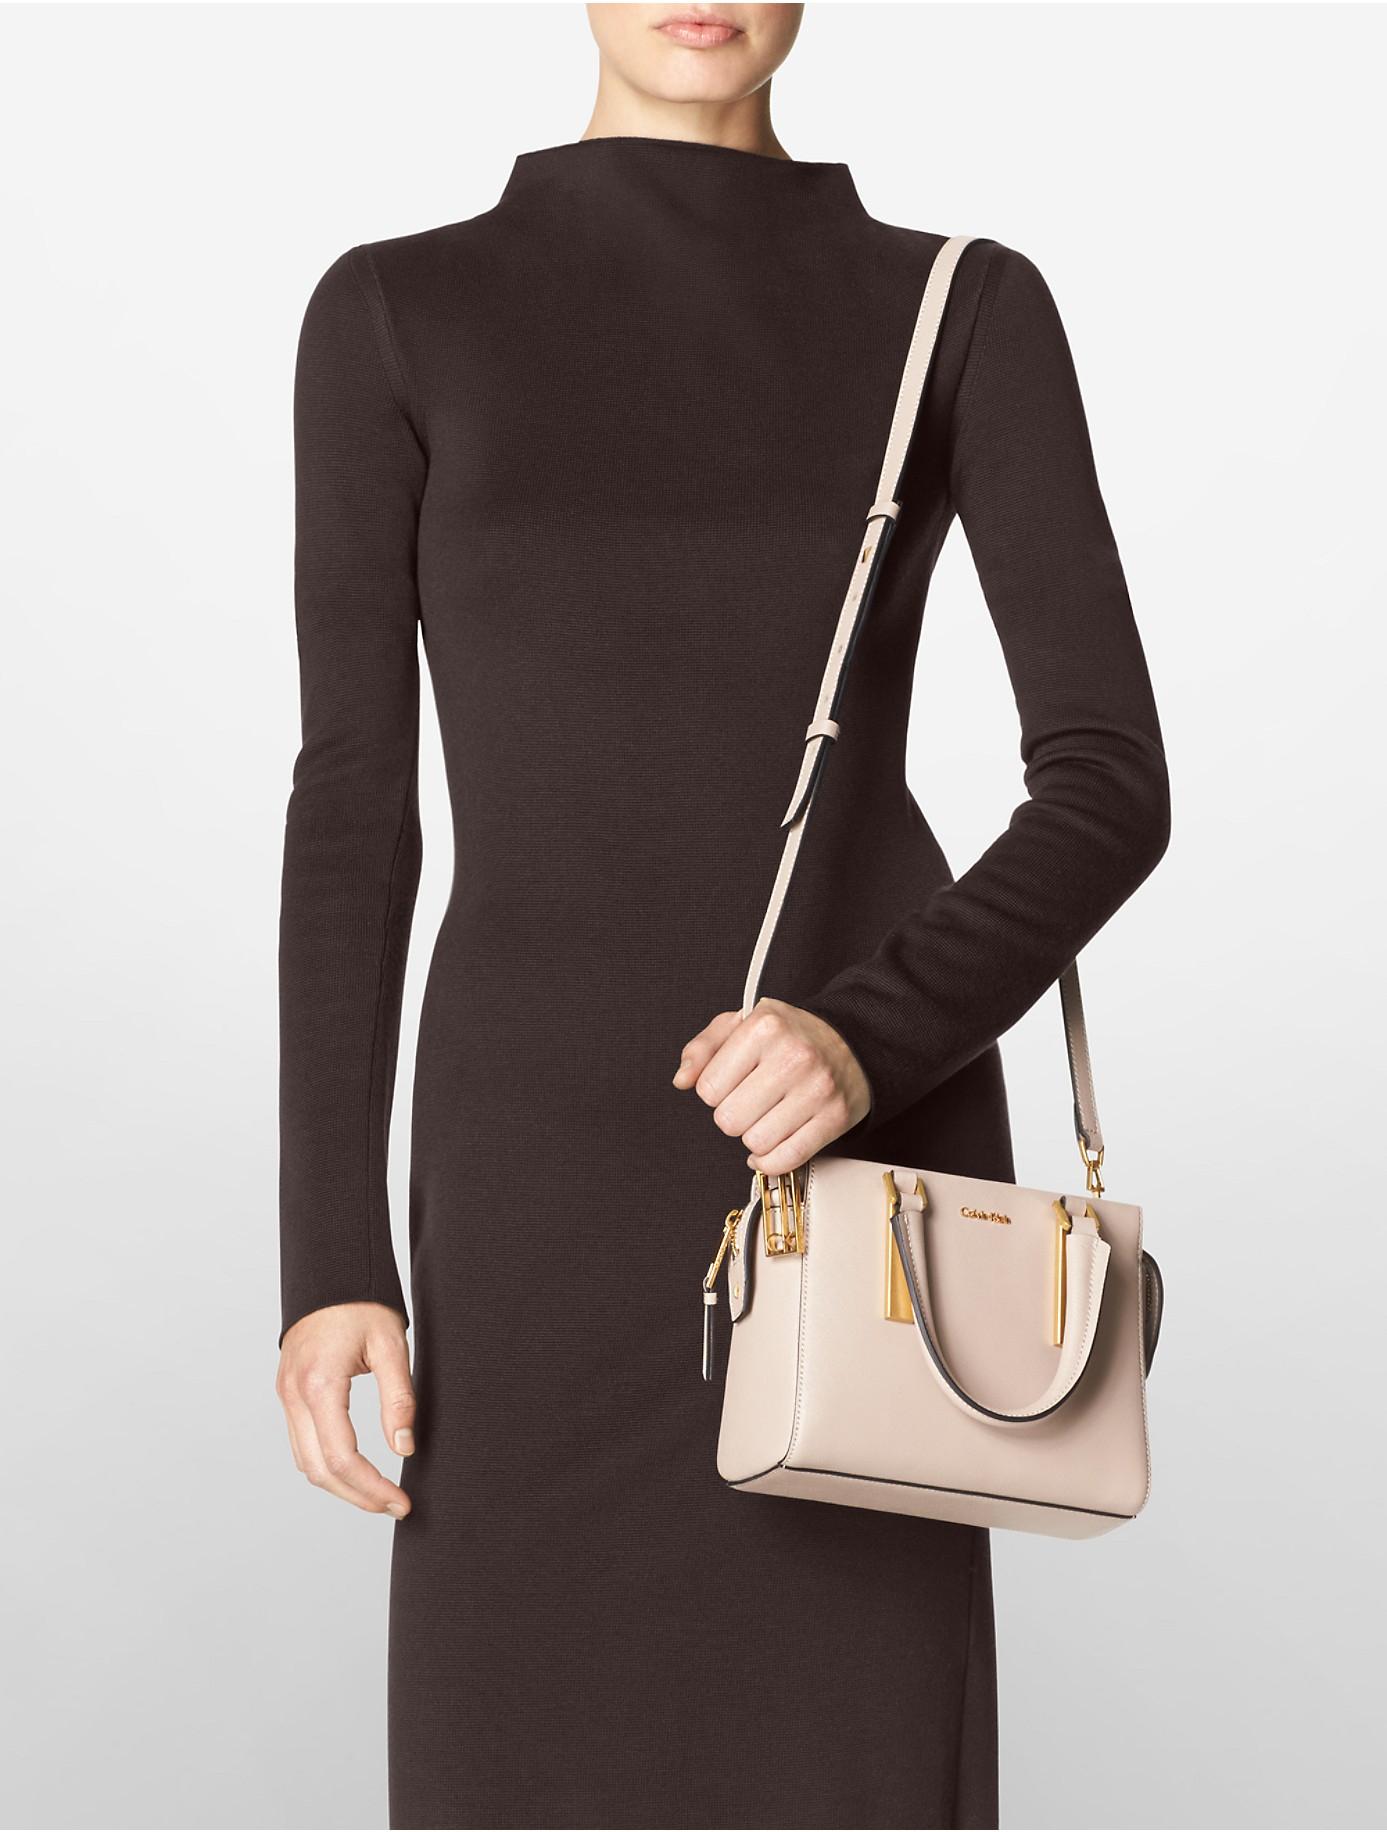 Lyst Calvin Klein Galey Saffiano Leather Studio Satchel